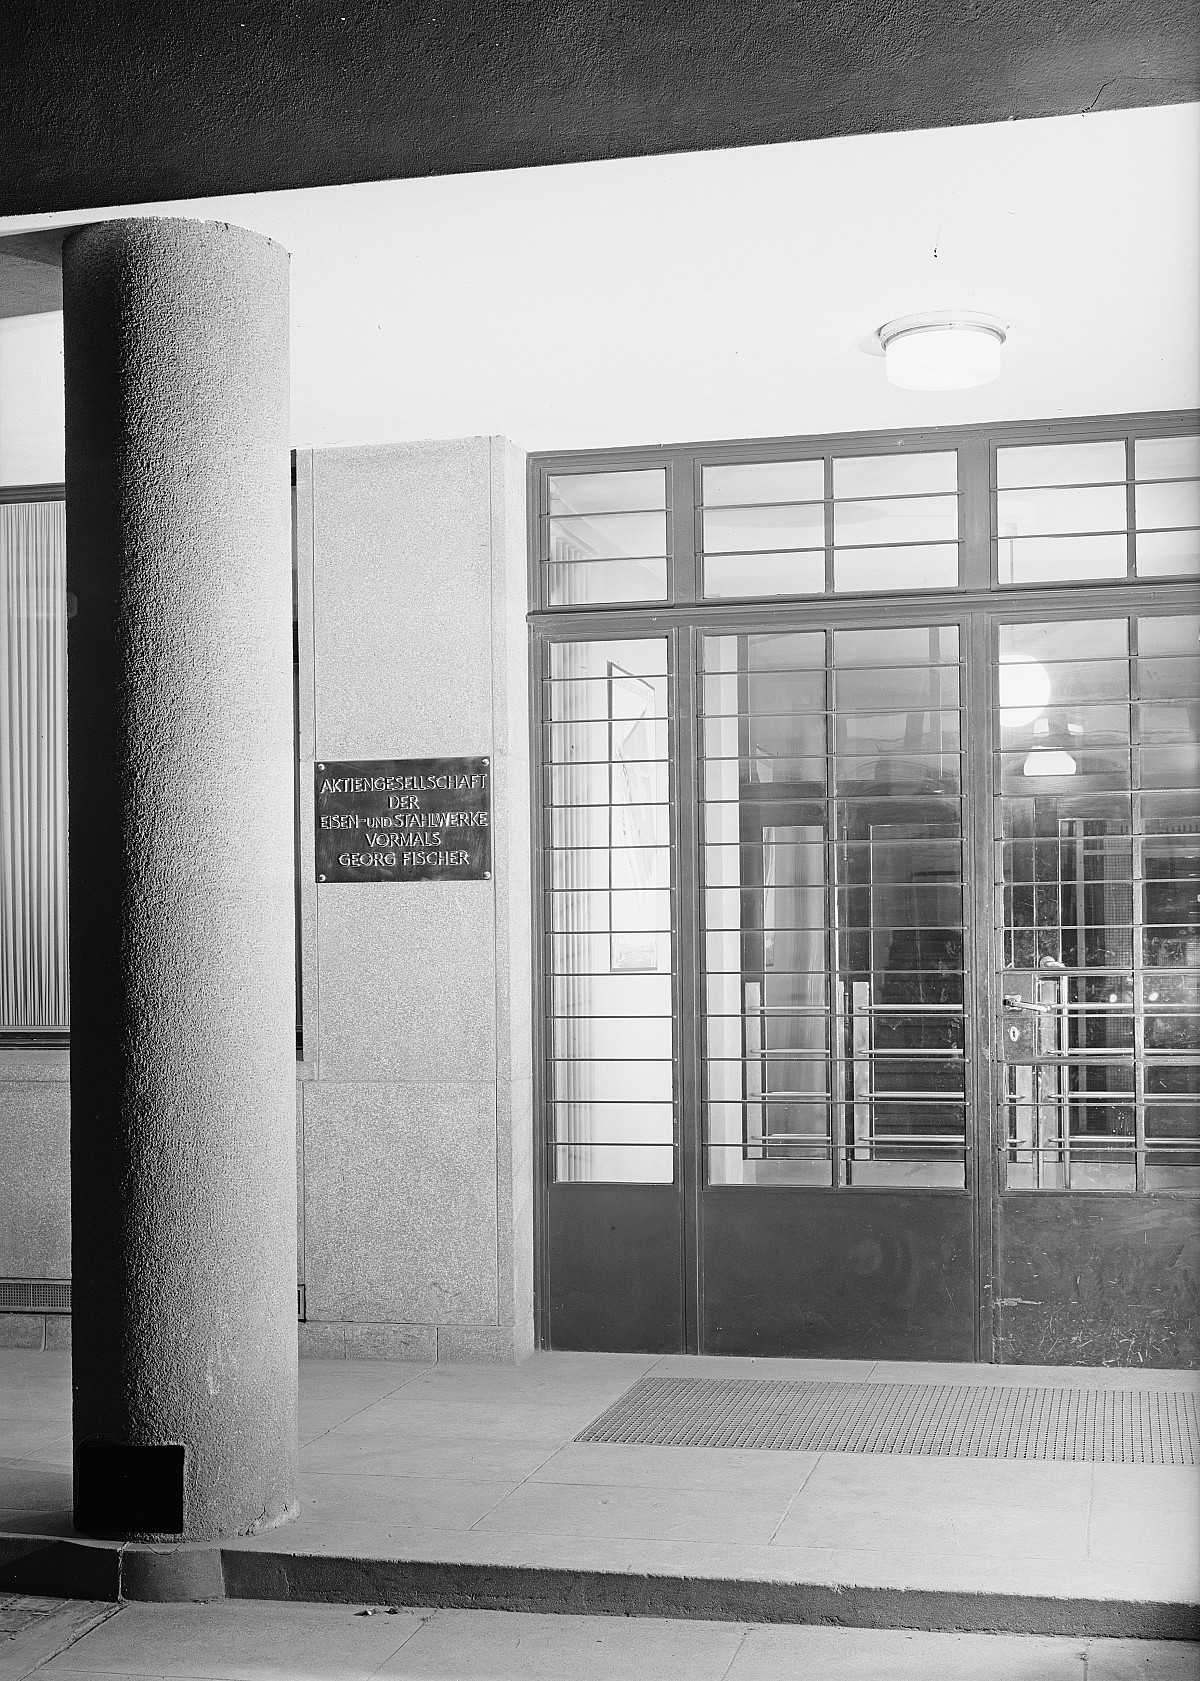 GFA 16/39259: Entrance administration building, Mühlental